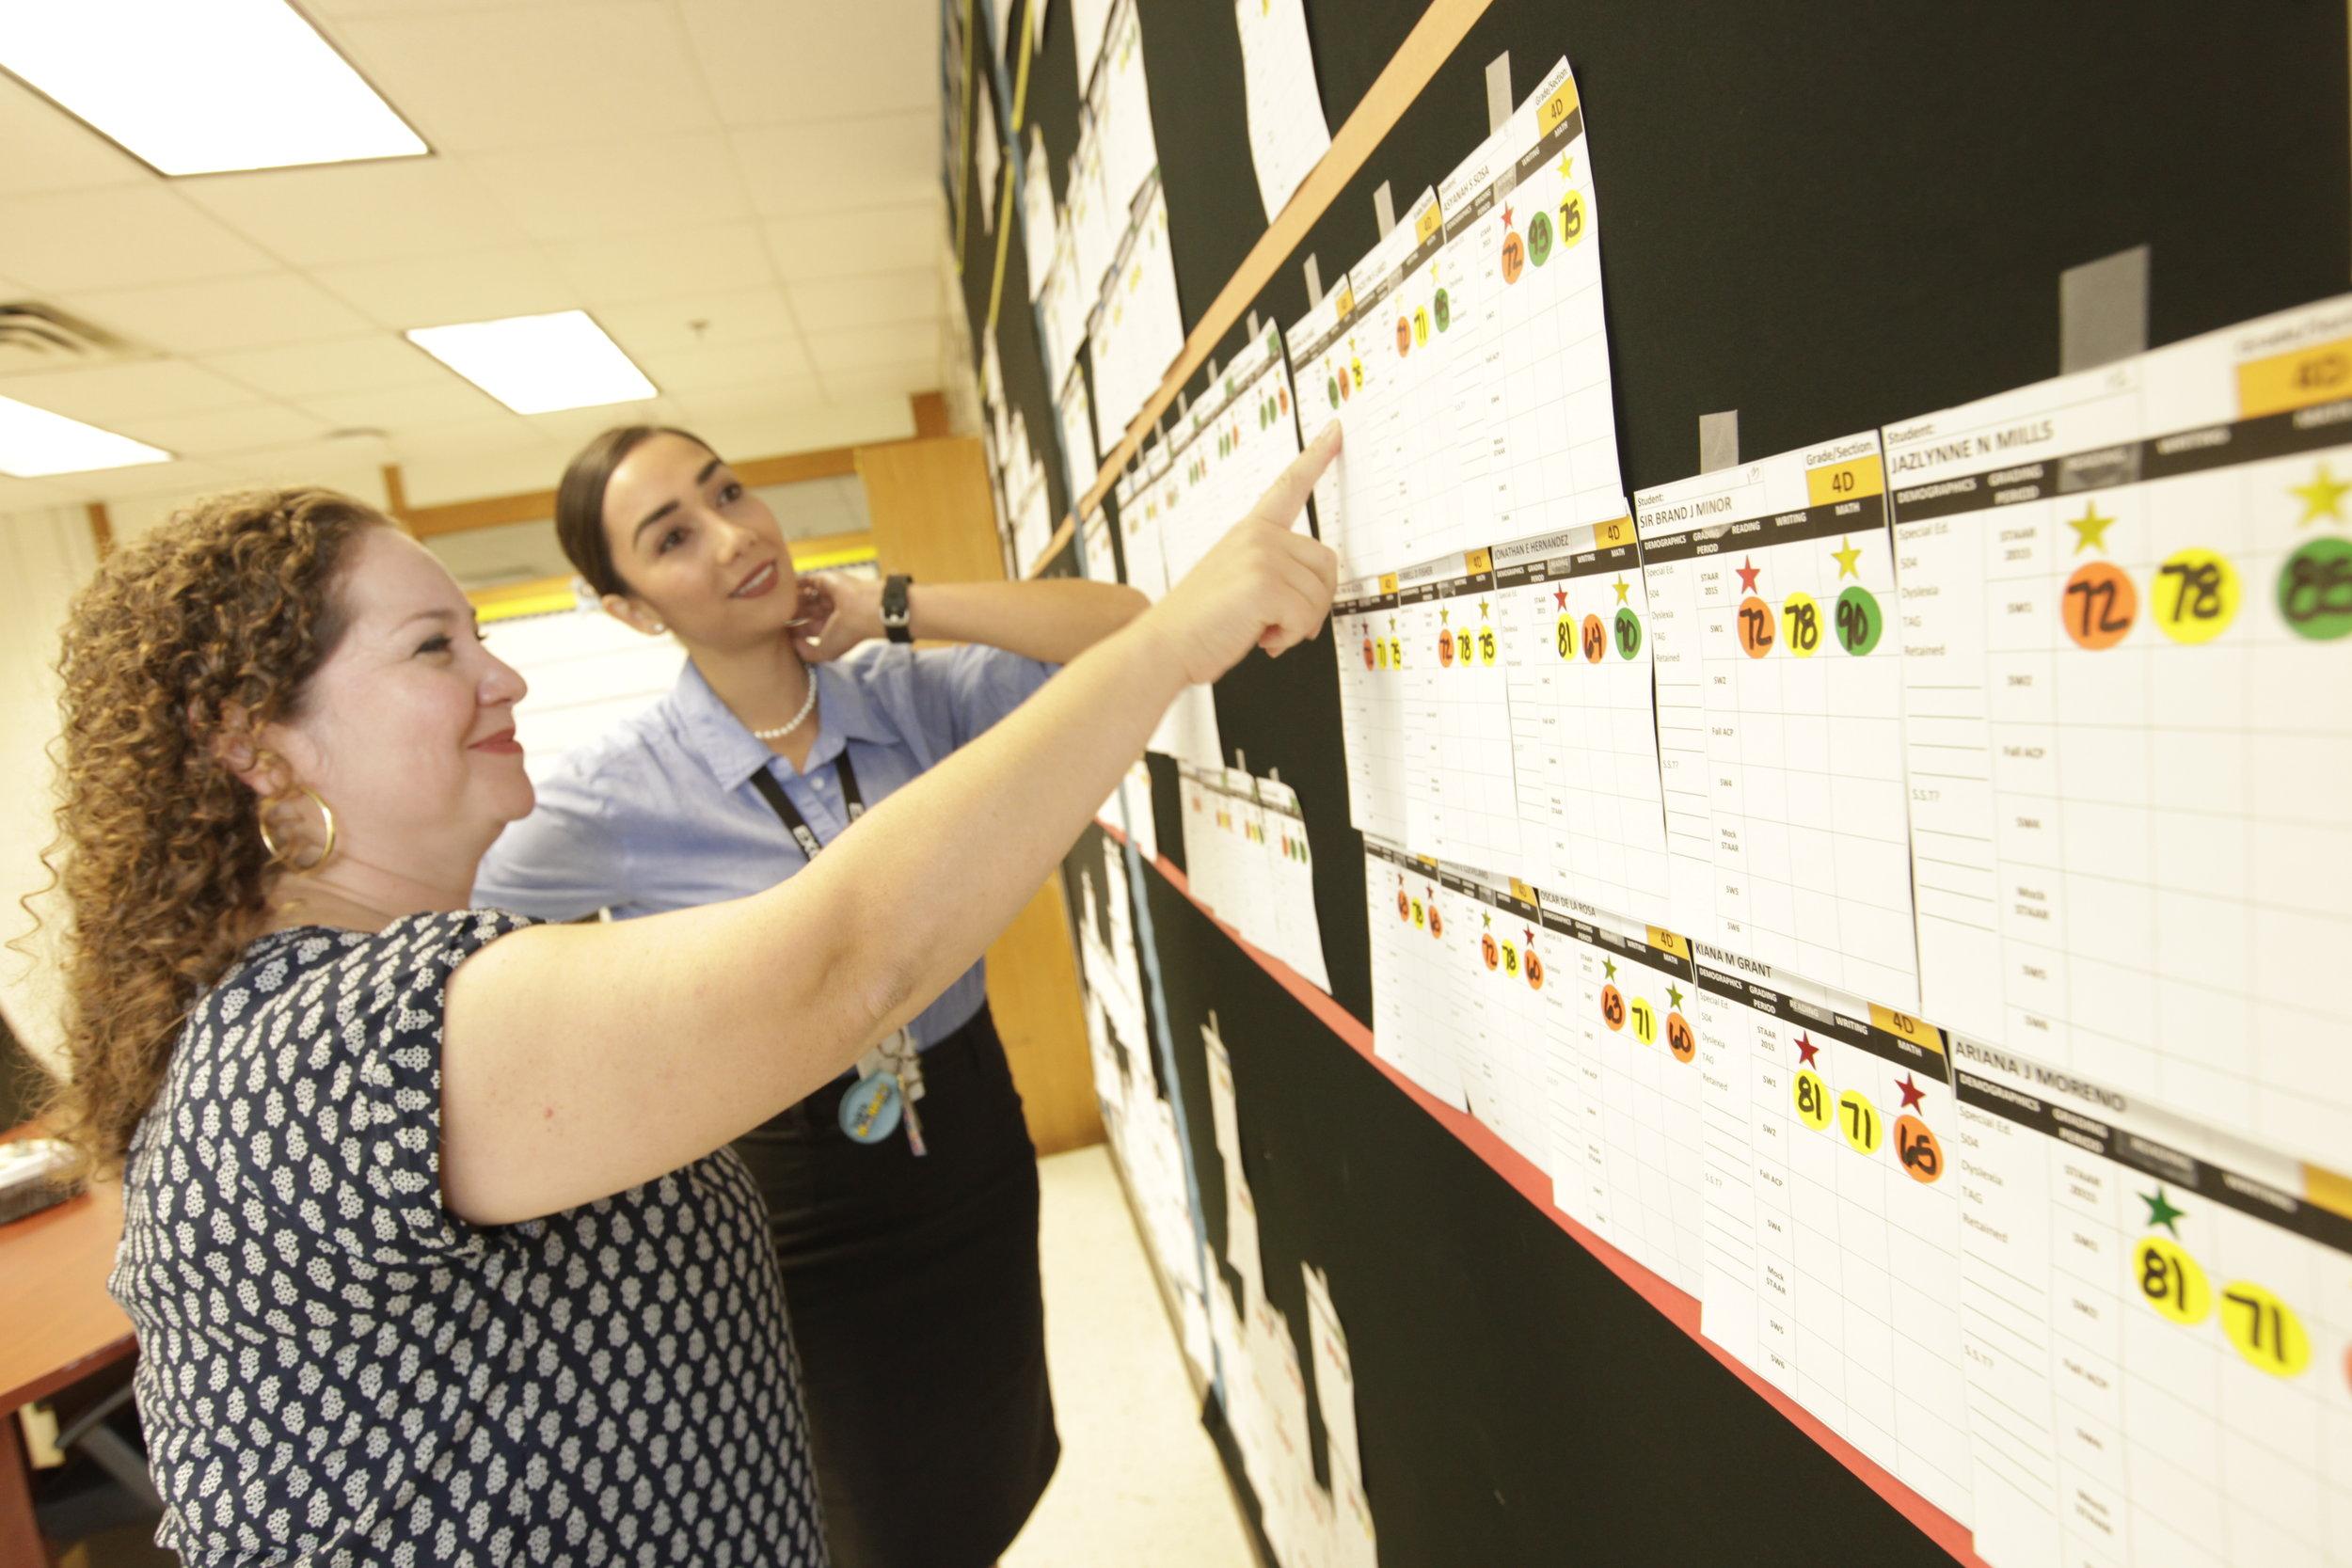 Principal Laura Garza and Math Instructional Coach Alicia Iwasko review individual student data on the school's data wall.